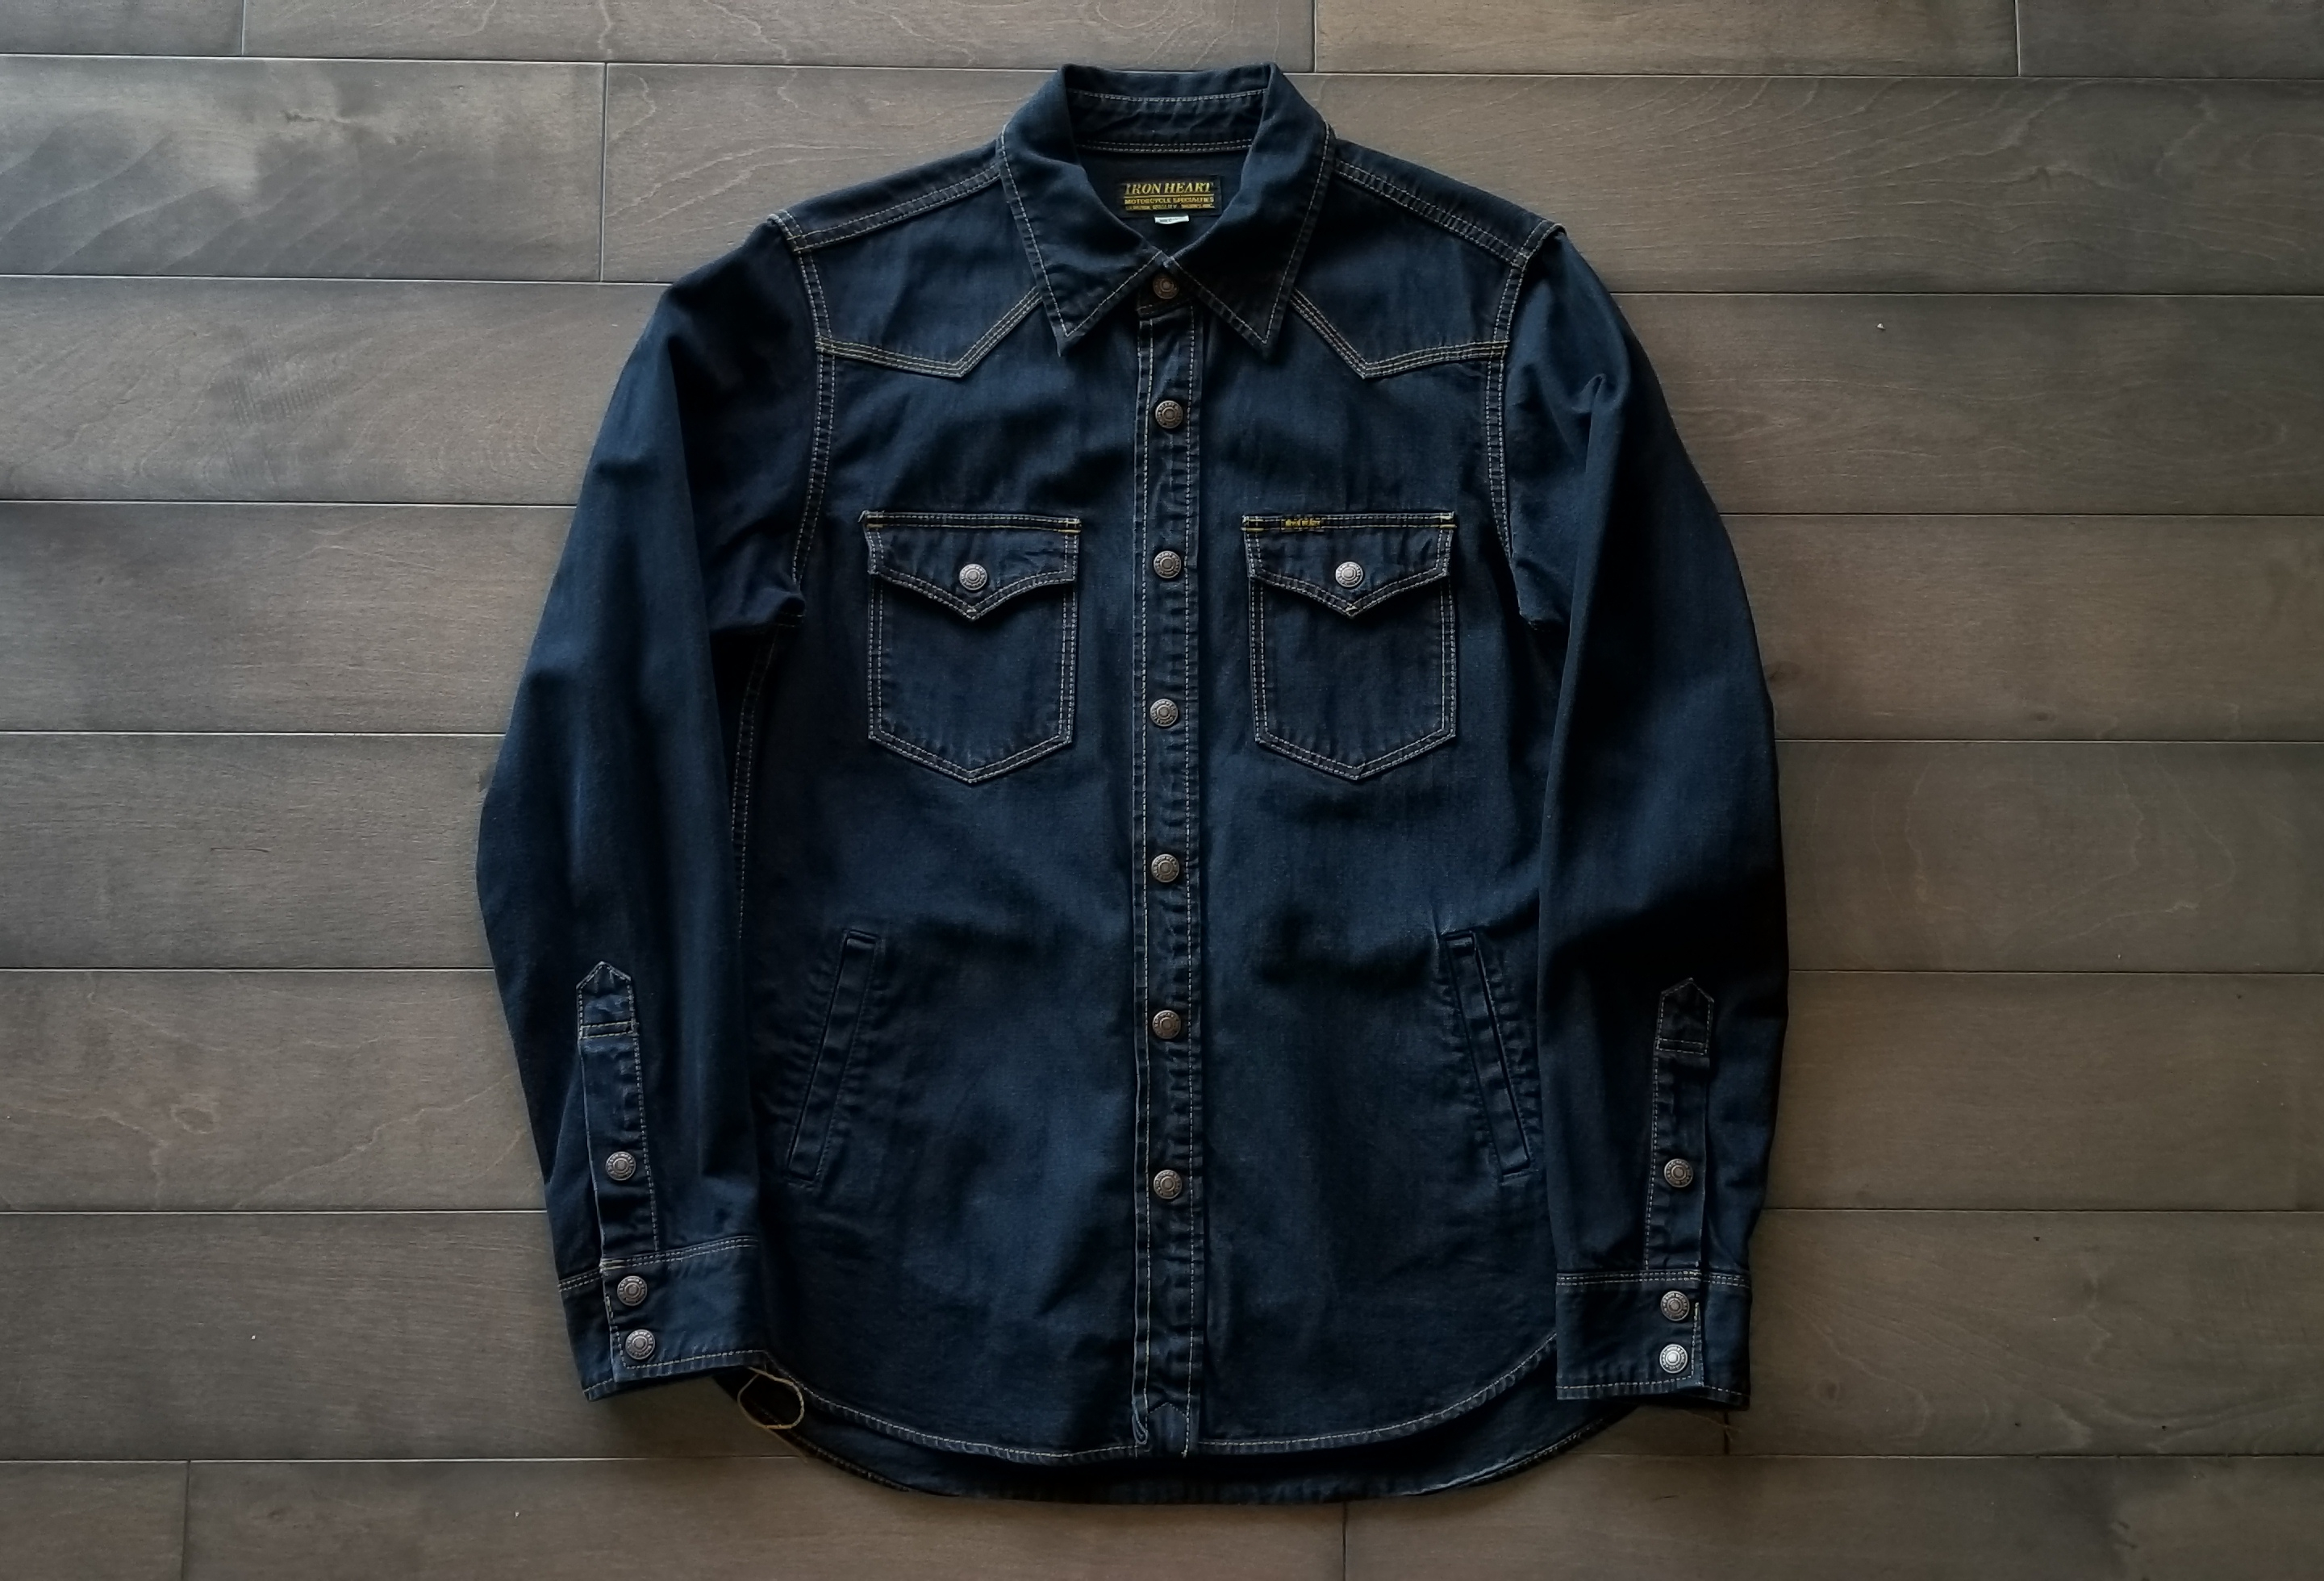 483be535f97 Iron Heart Overdyed Black 11.5oz Denim Overshirt W  Hand Pockets ...